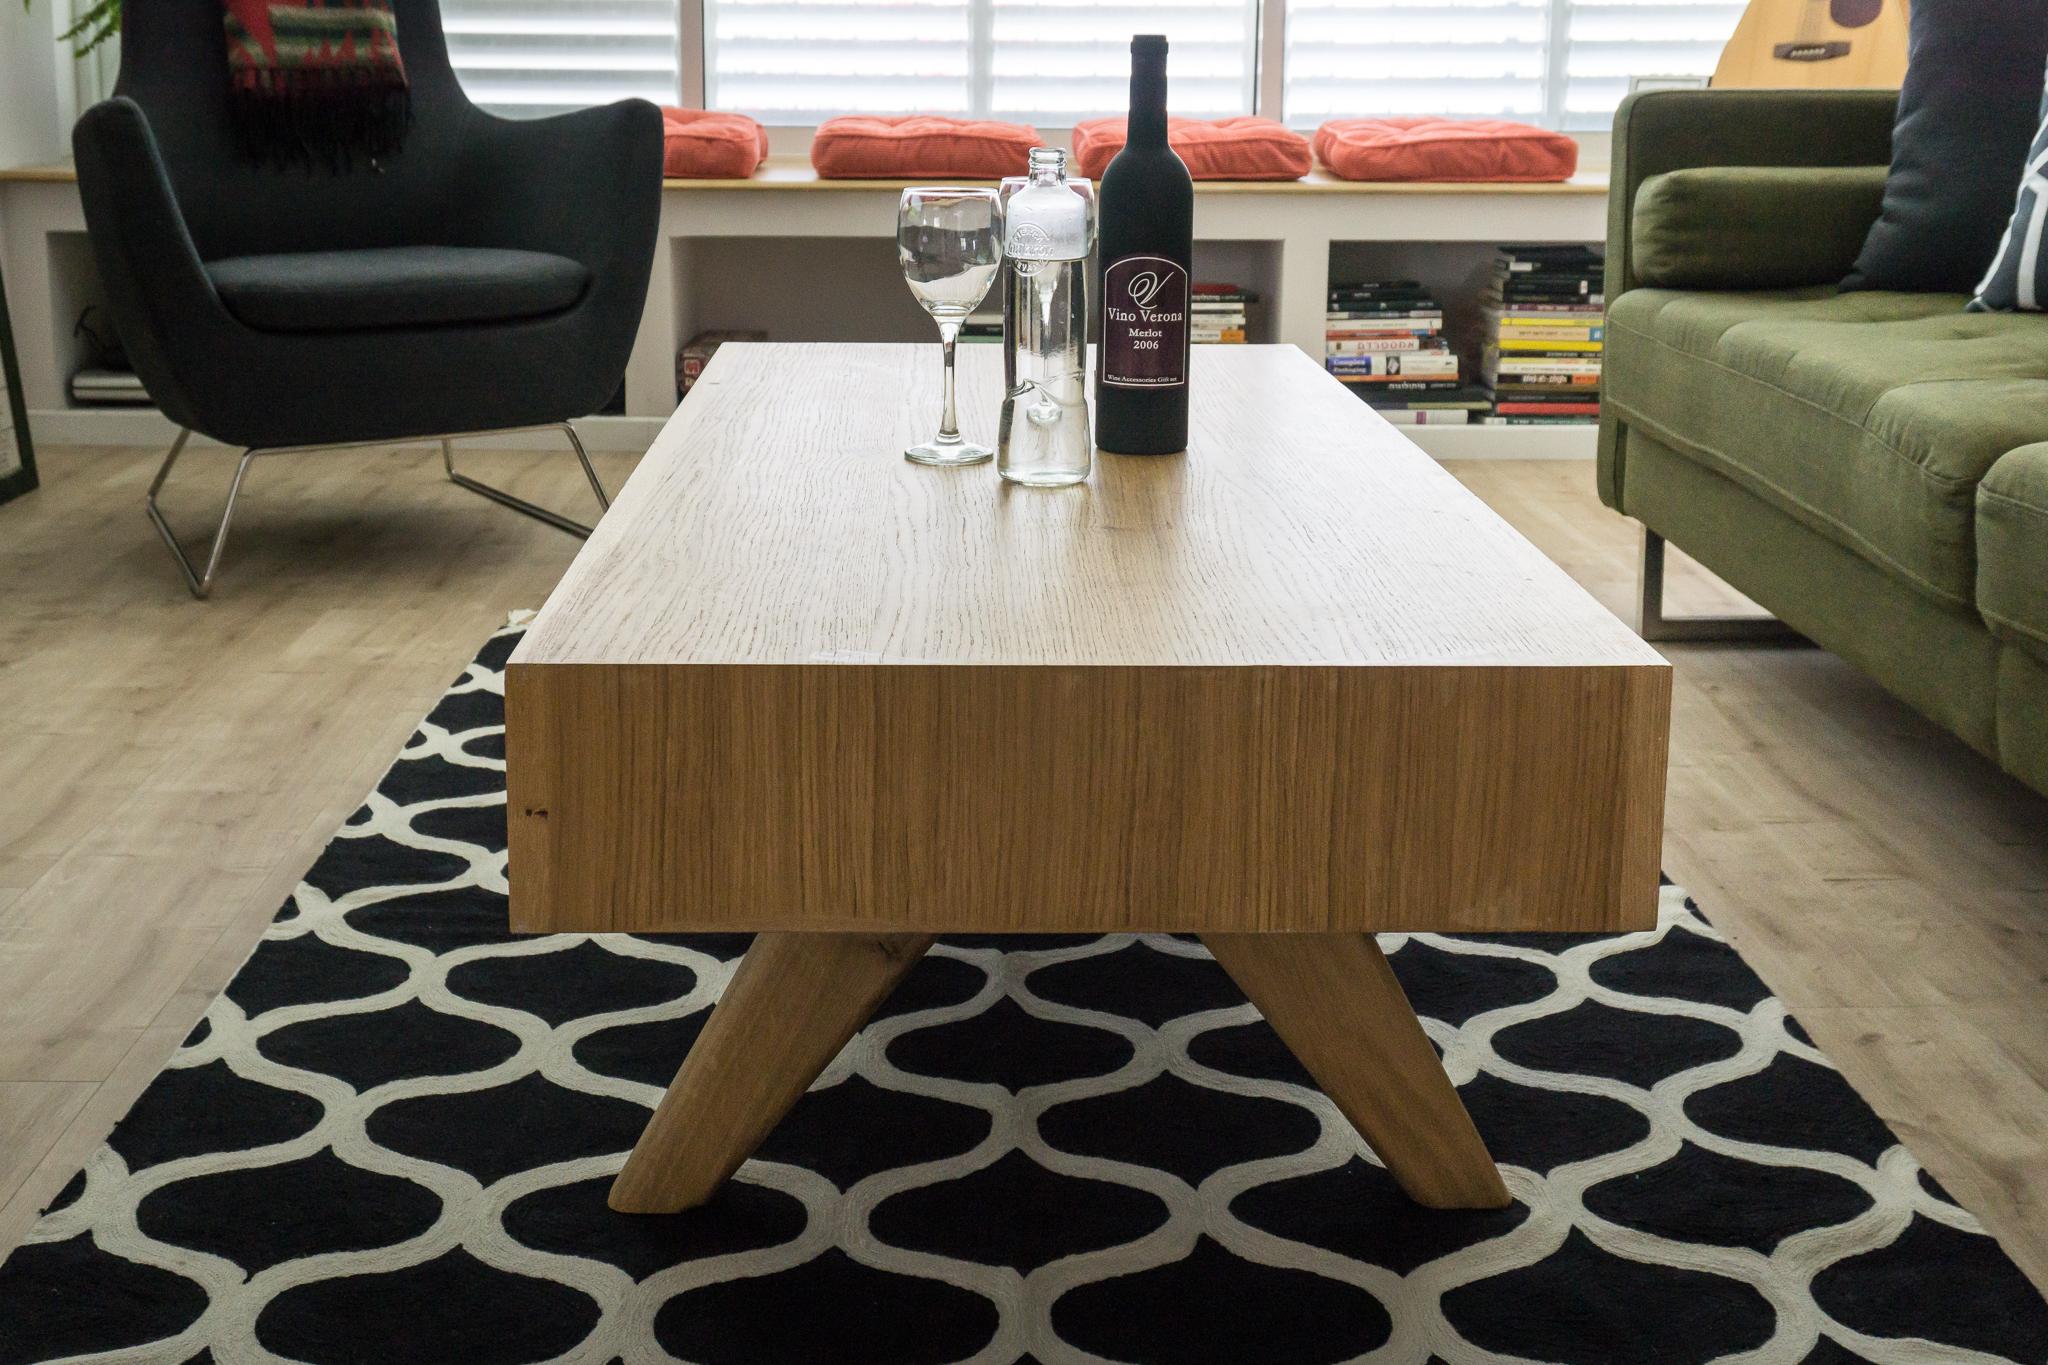 ספסל גבס, שטיח צמר מודרני